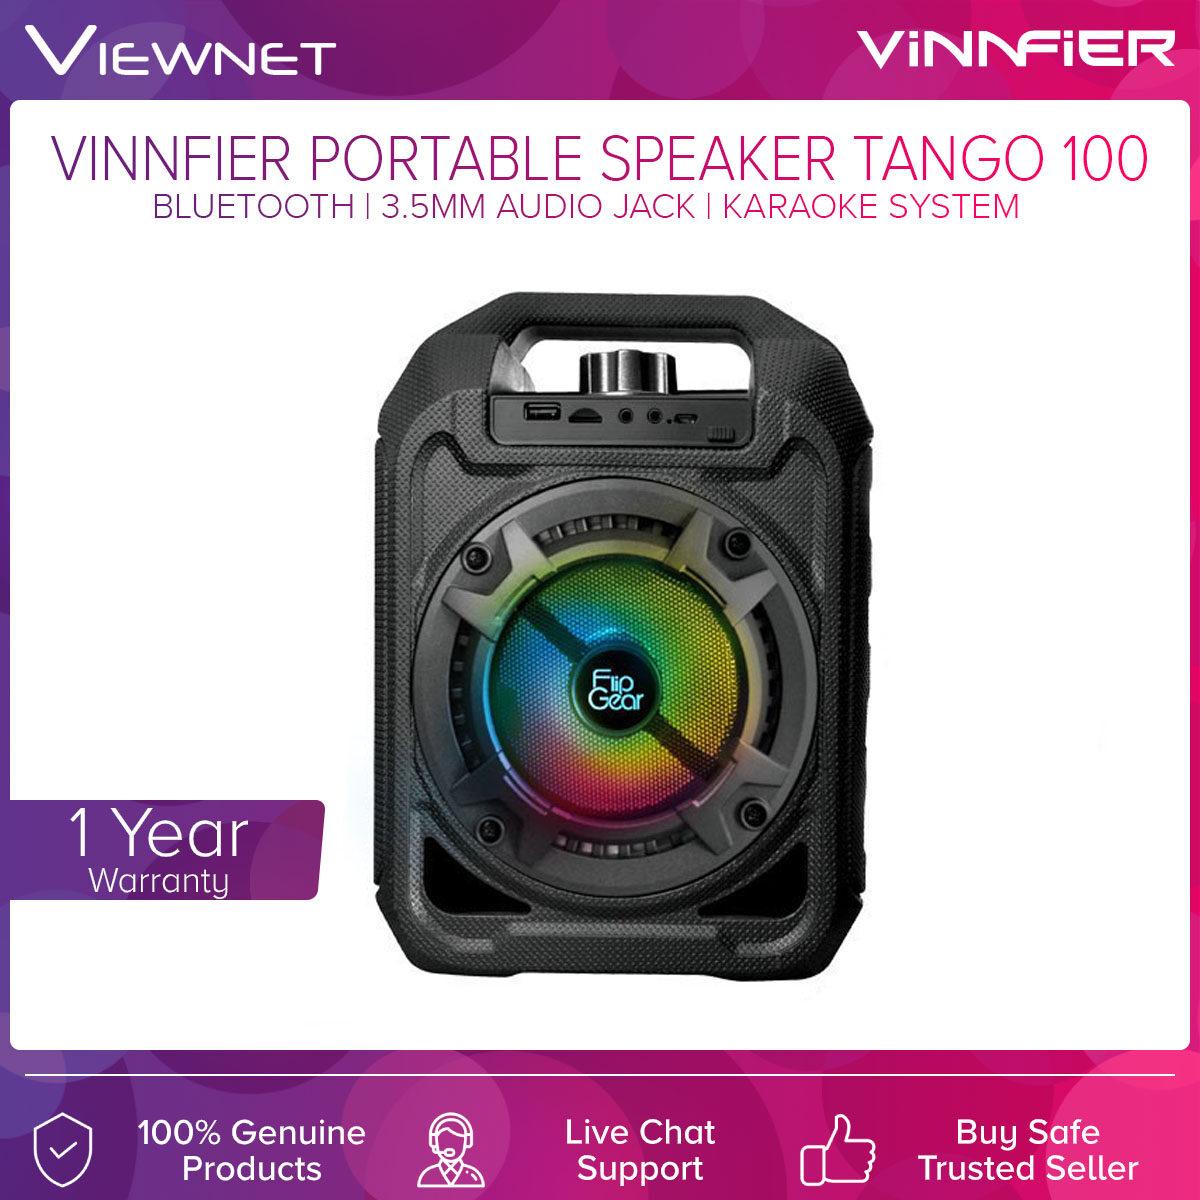 Vinnfier Portable Speaker Tango 100 with Bluetooth Connection, USB & Micro SD Card Slot, 3.5M Audio Jack, FM Radio, Karaoke System, 20W Extra Bass